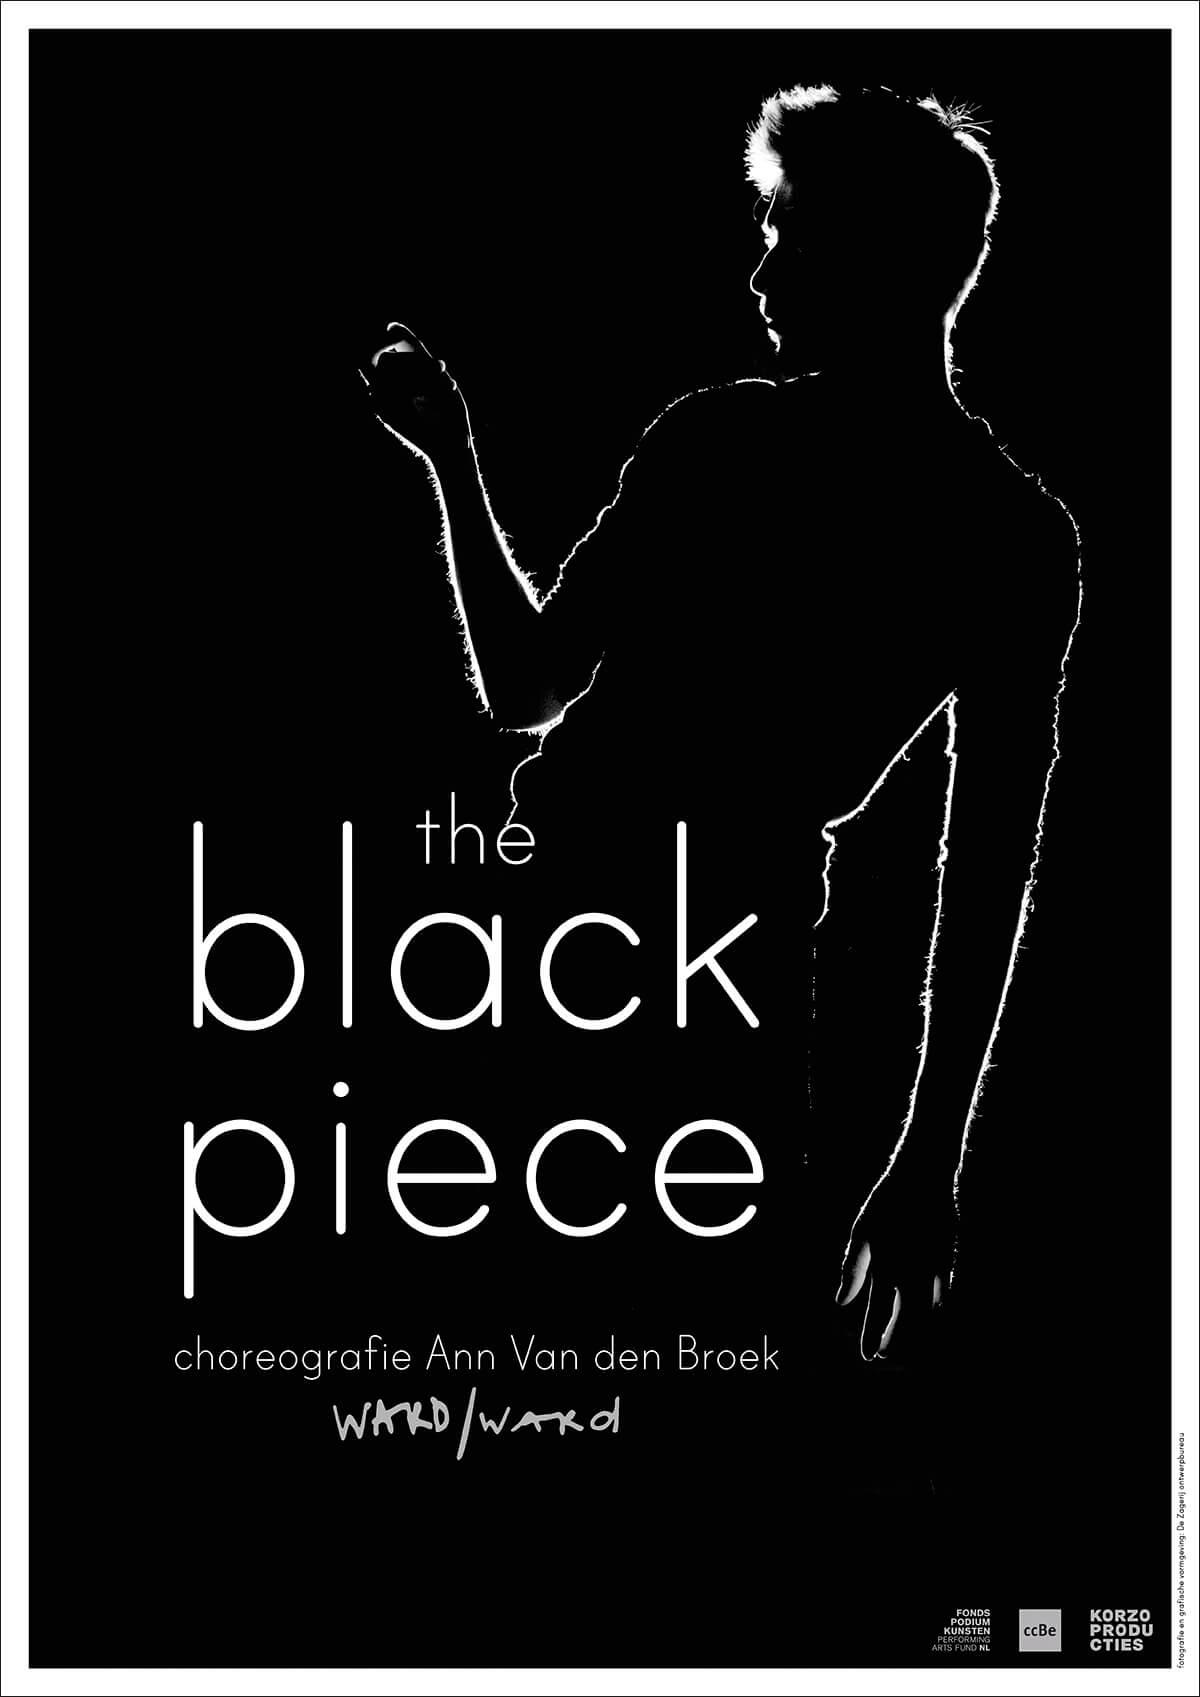 WArd/waRD - The Black Piece